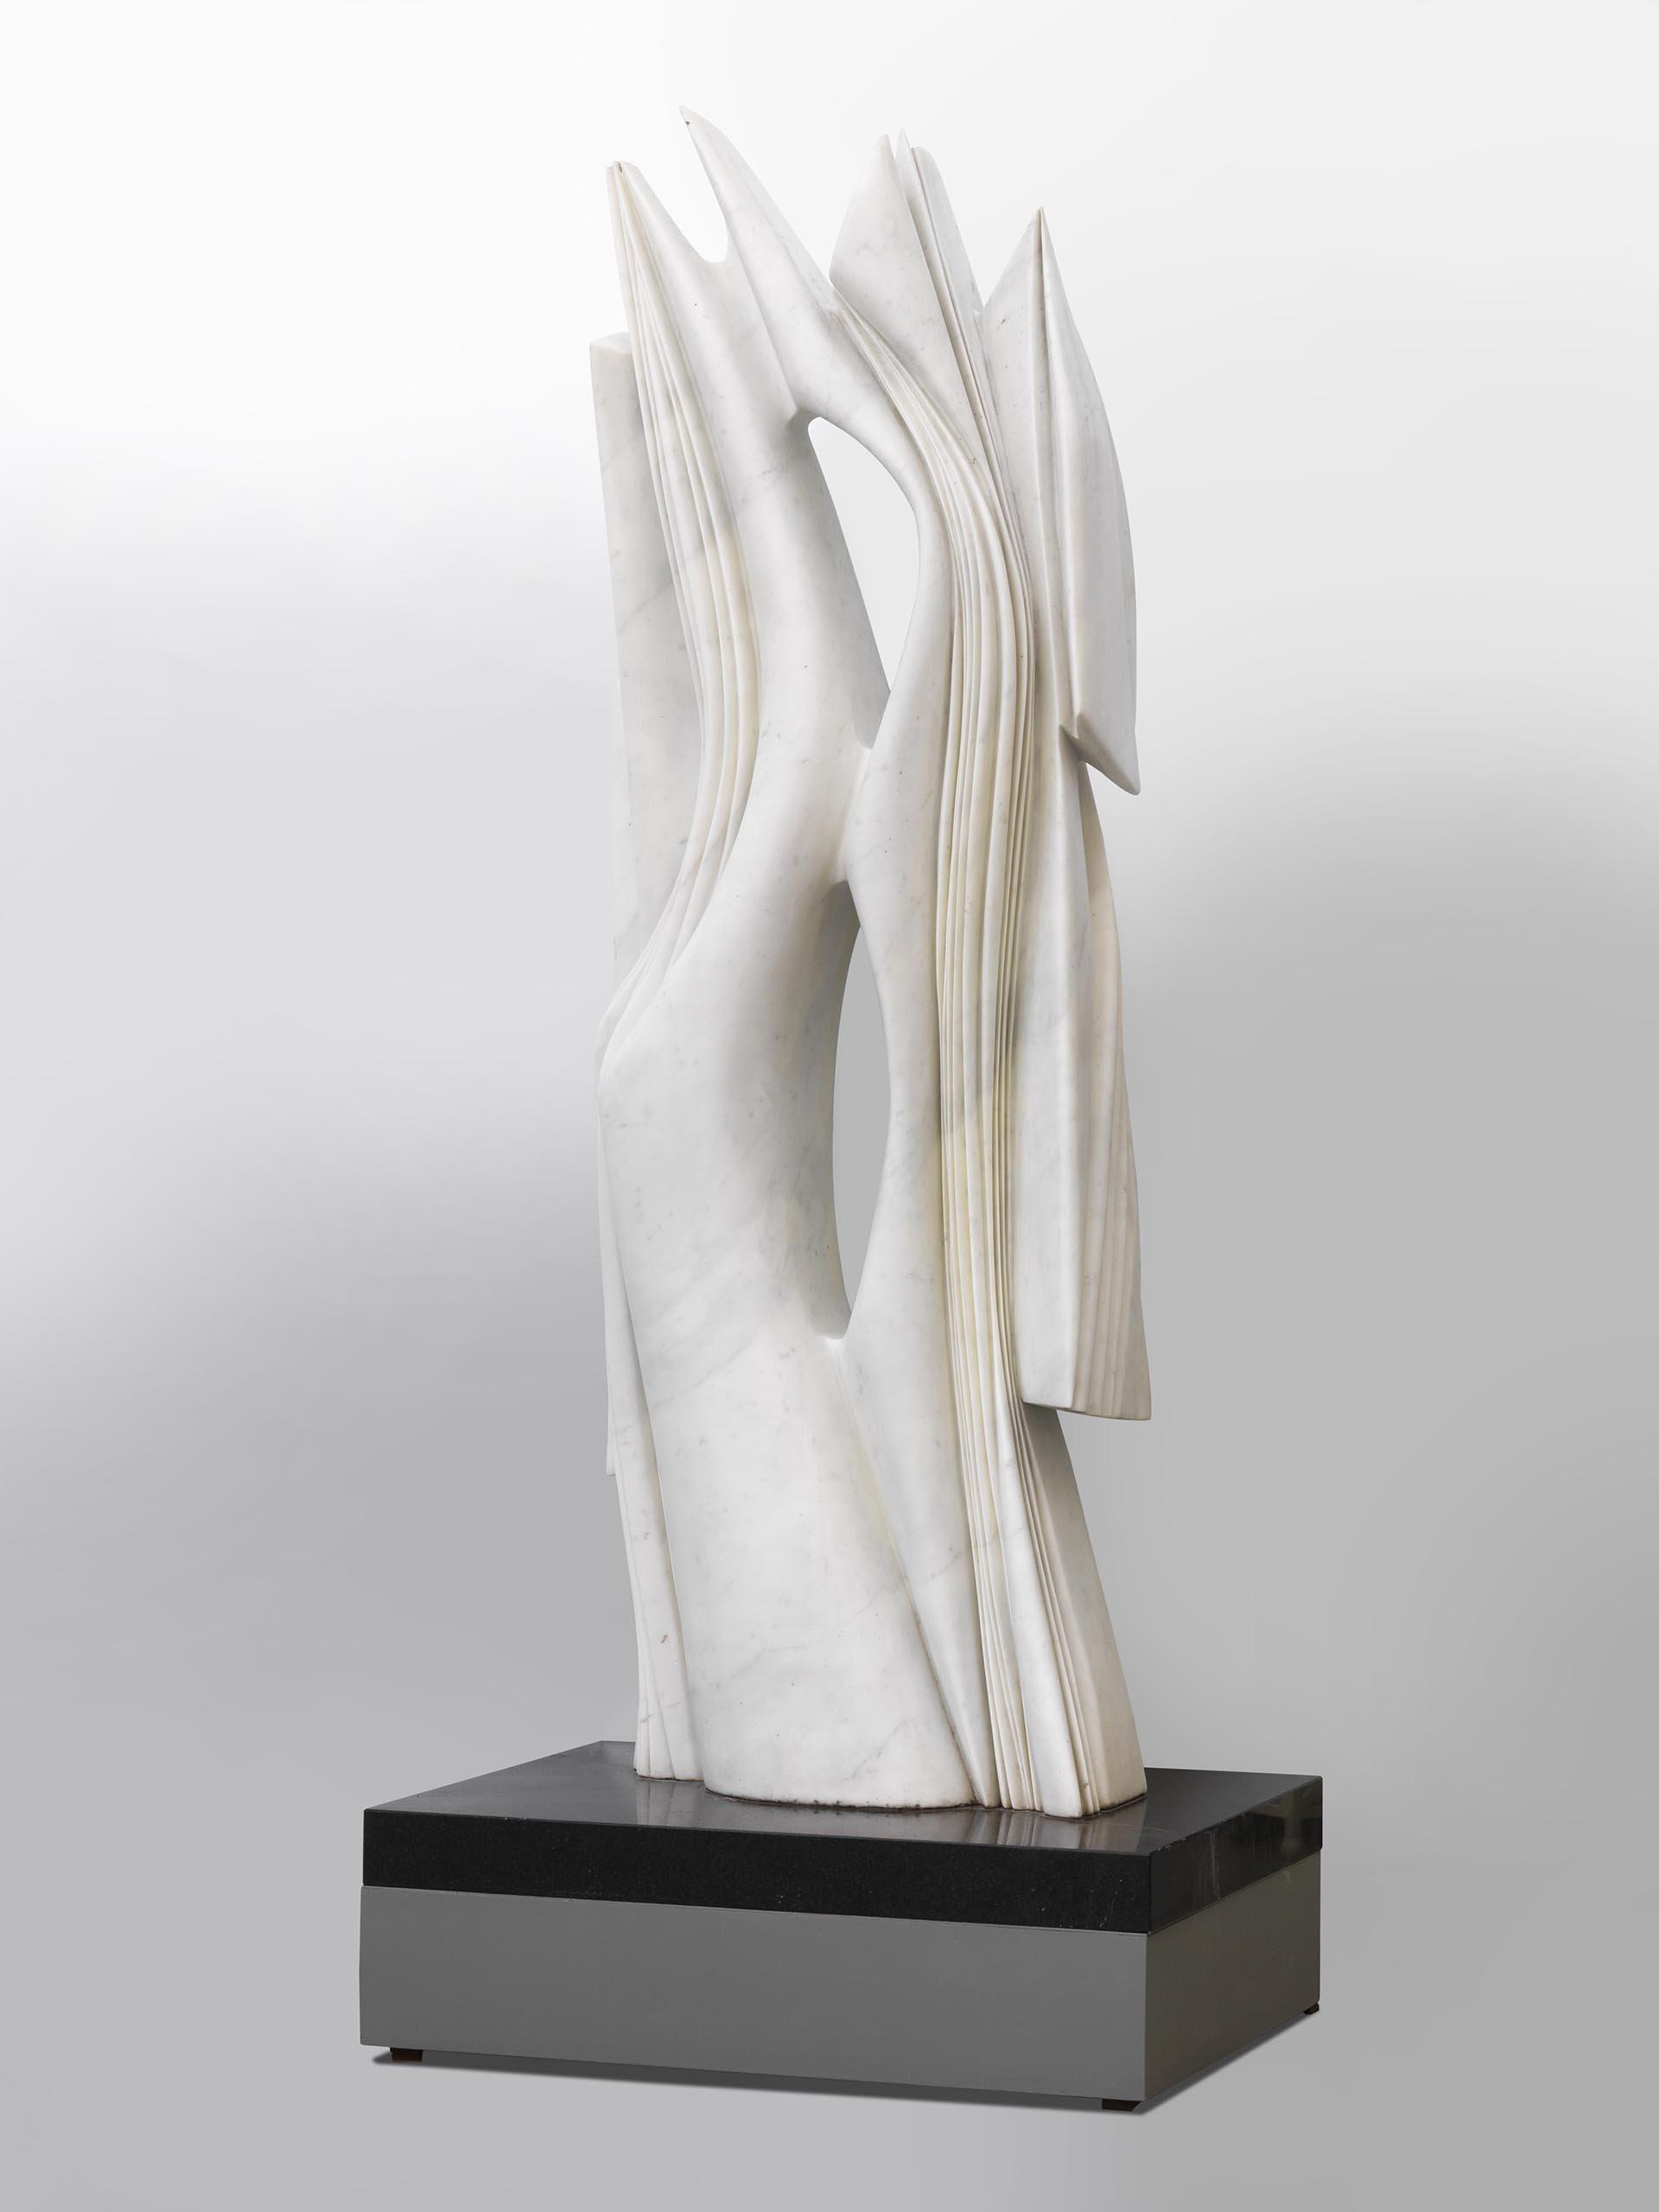 Atchugarry, Senza titolo, 2010, 220x33x73 cm